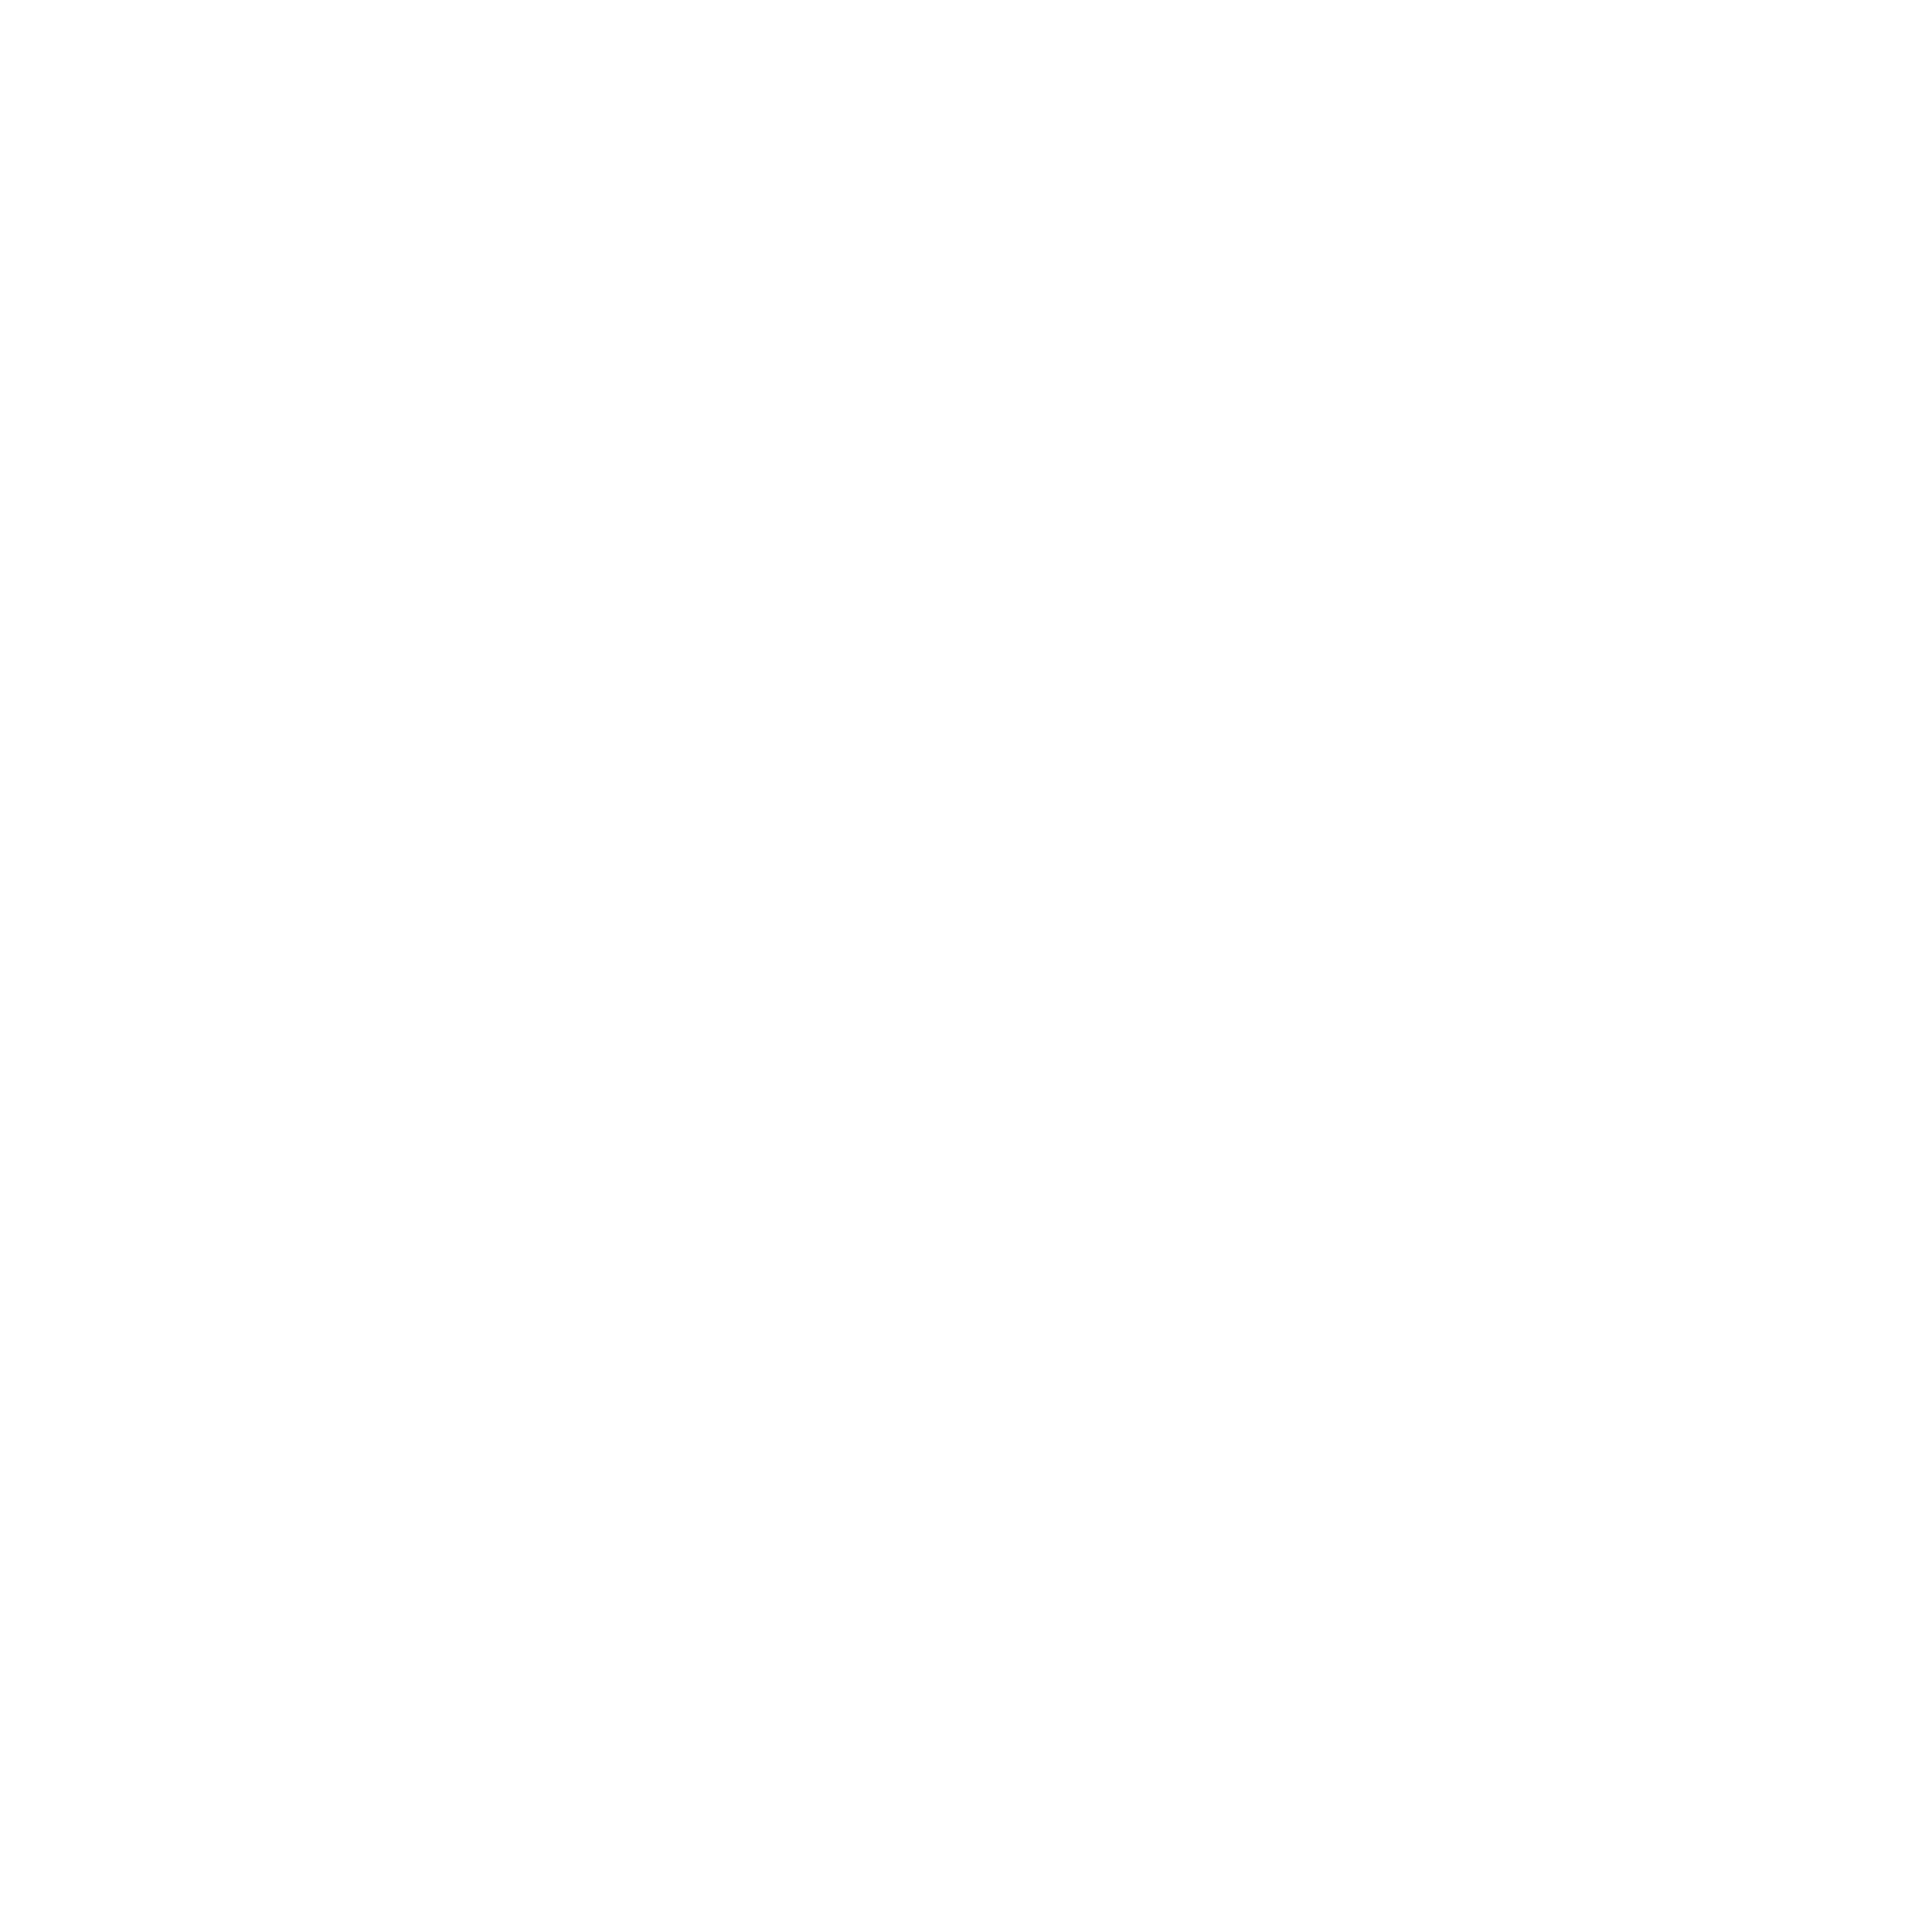 AURELIE GASSER PHOTOGRAPHE